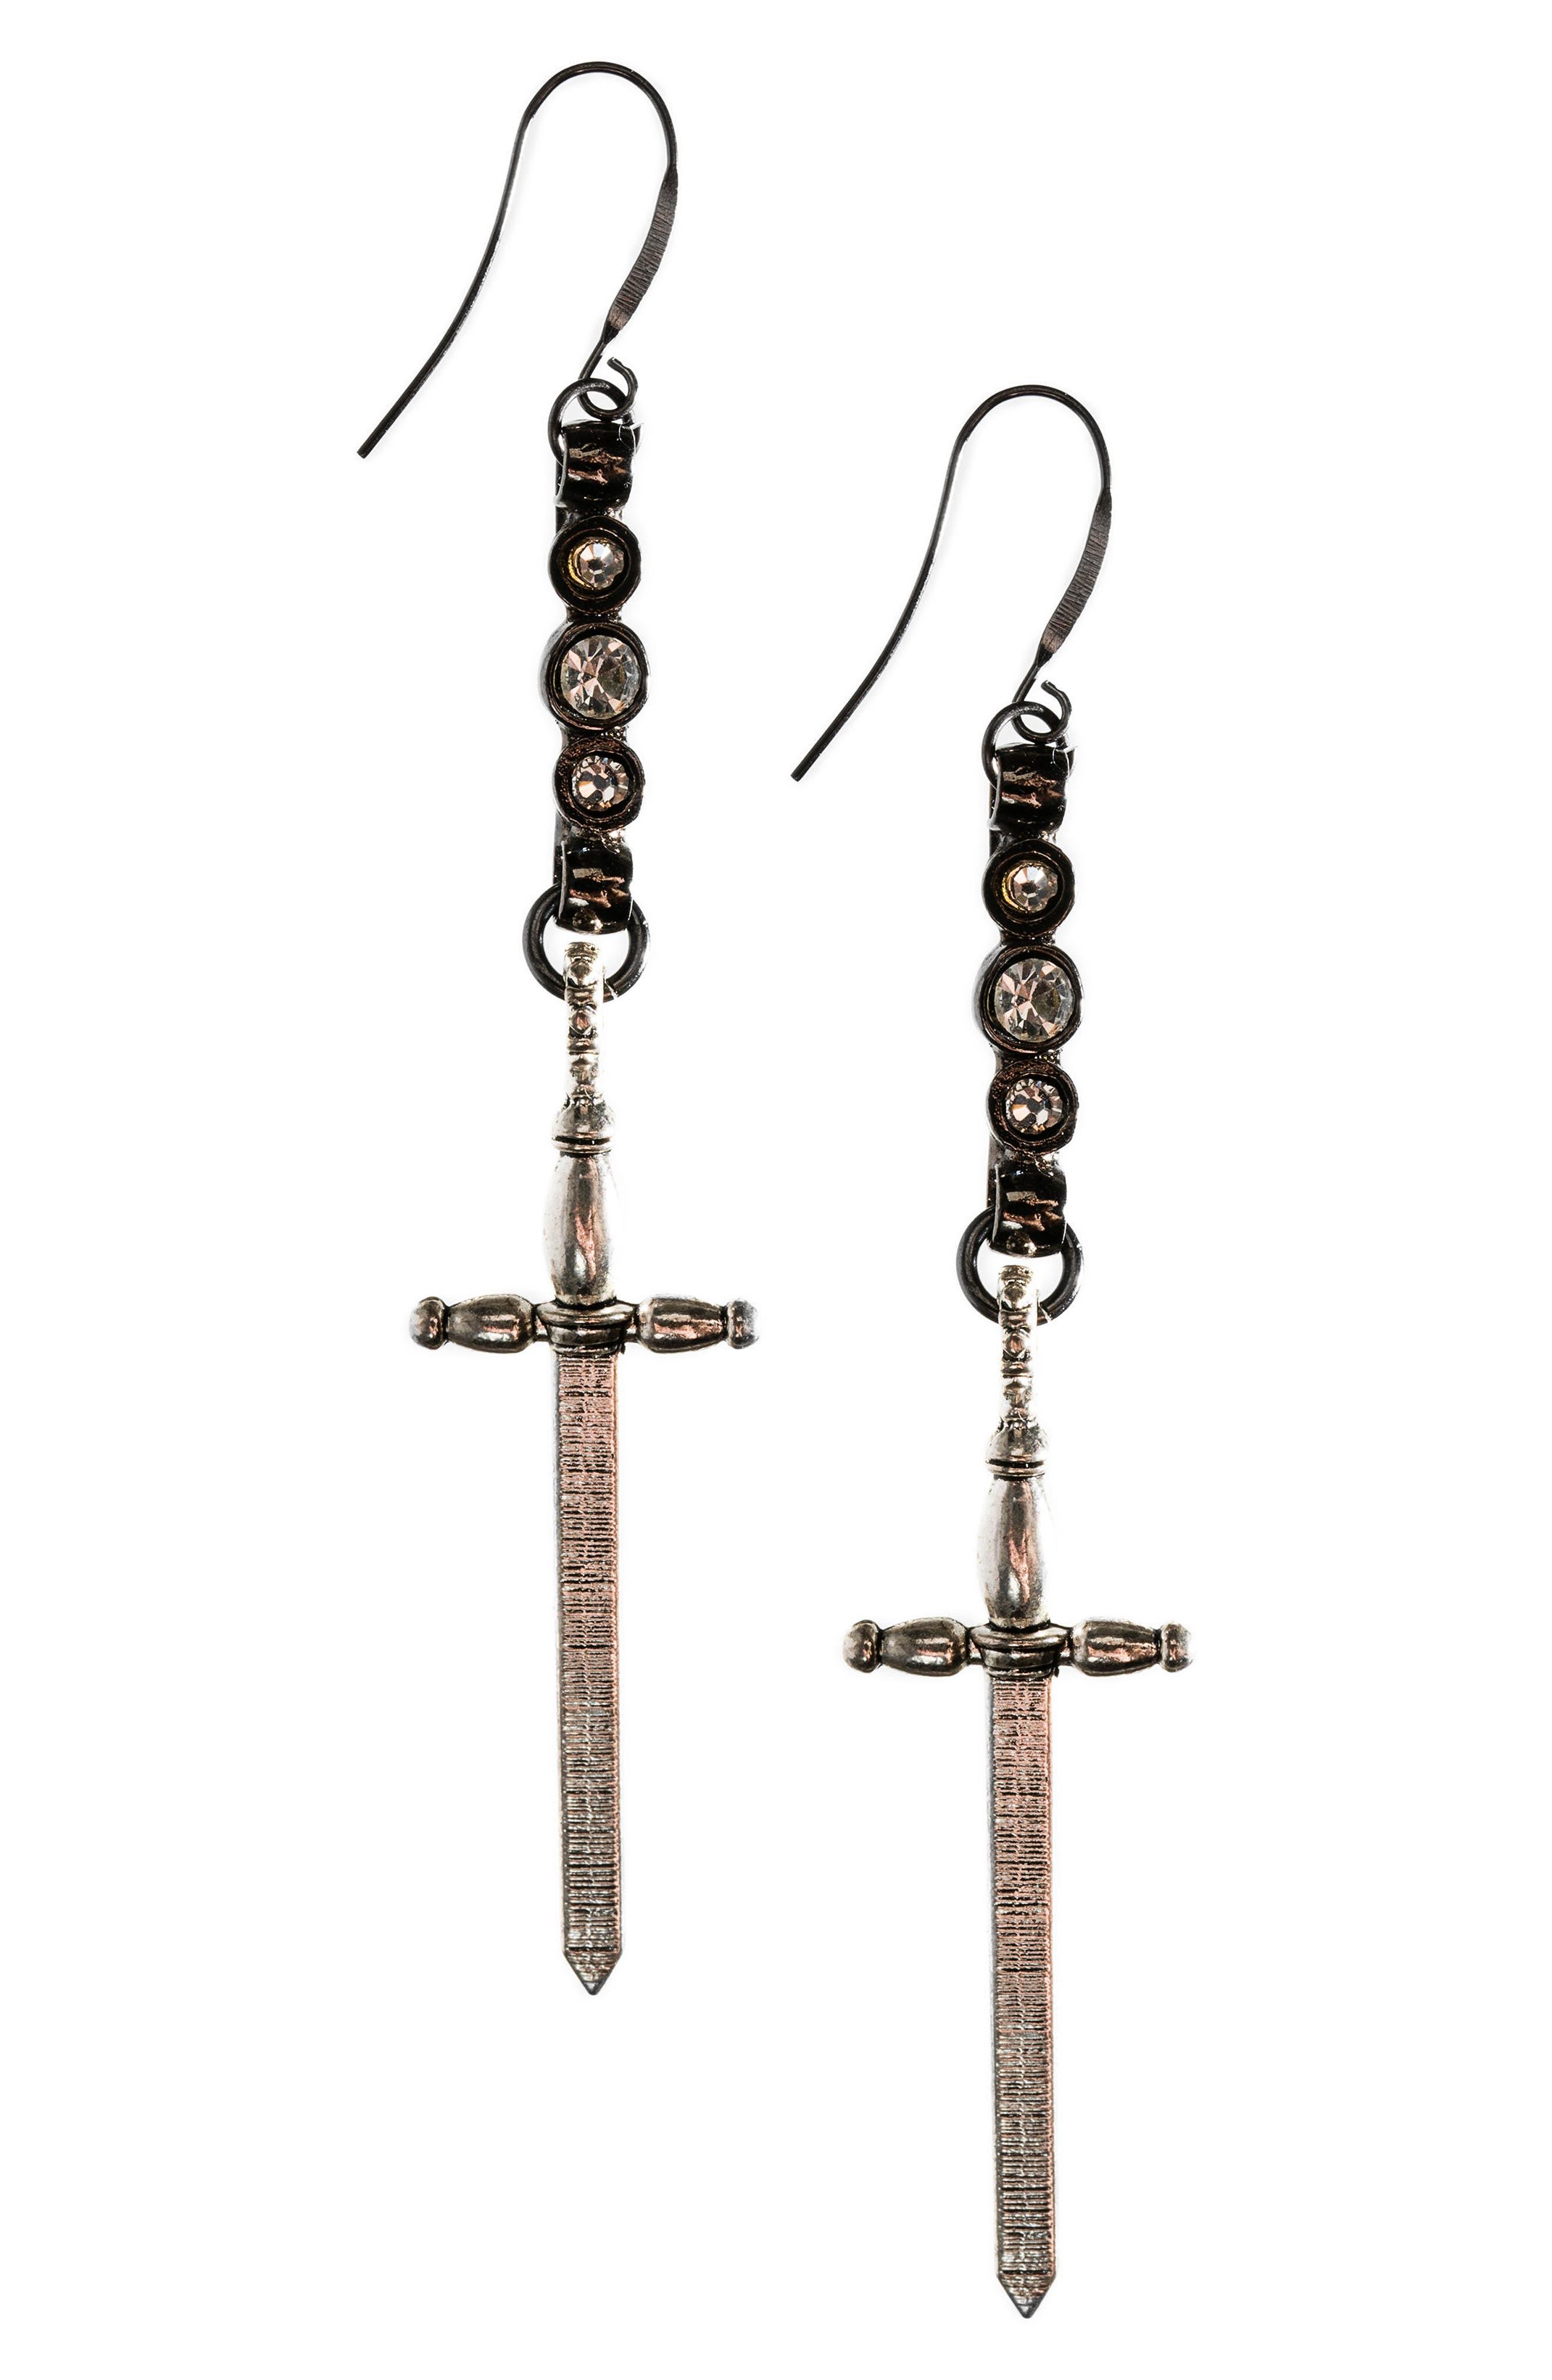 Spike Sword Drop Earrings,                             Main thumbnail 1, color,                             Silver/ Gunmetal